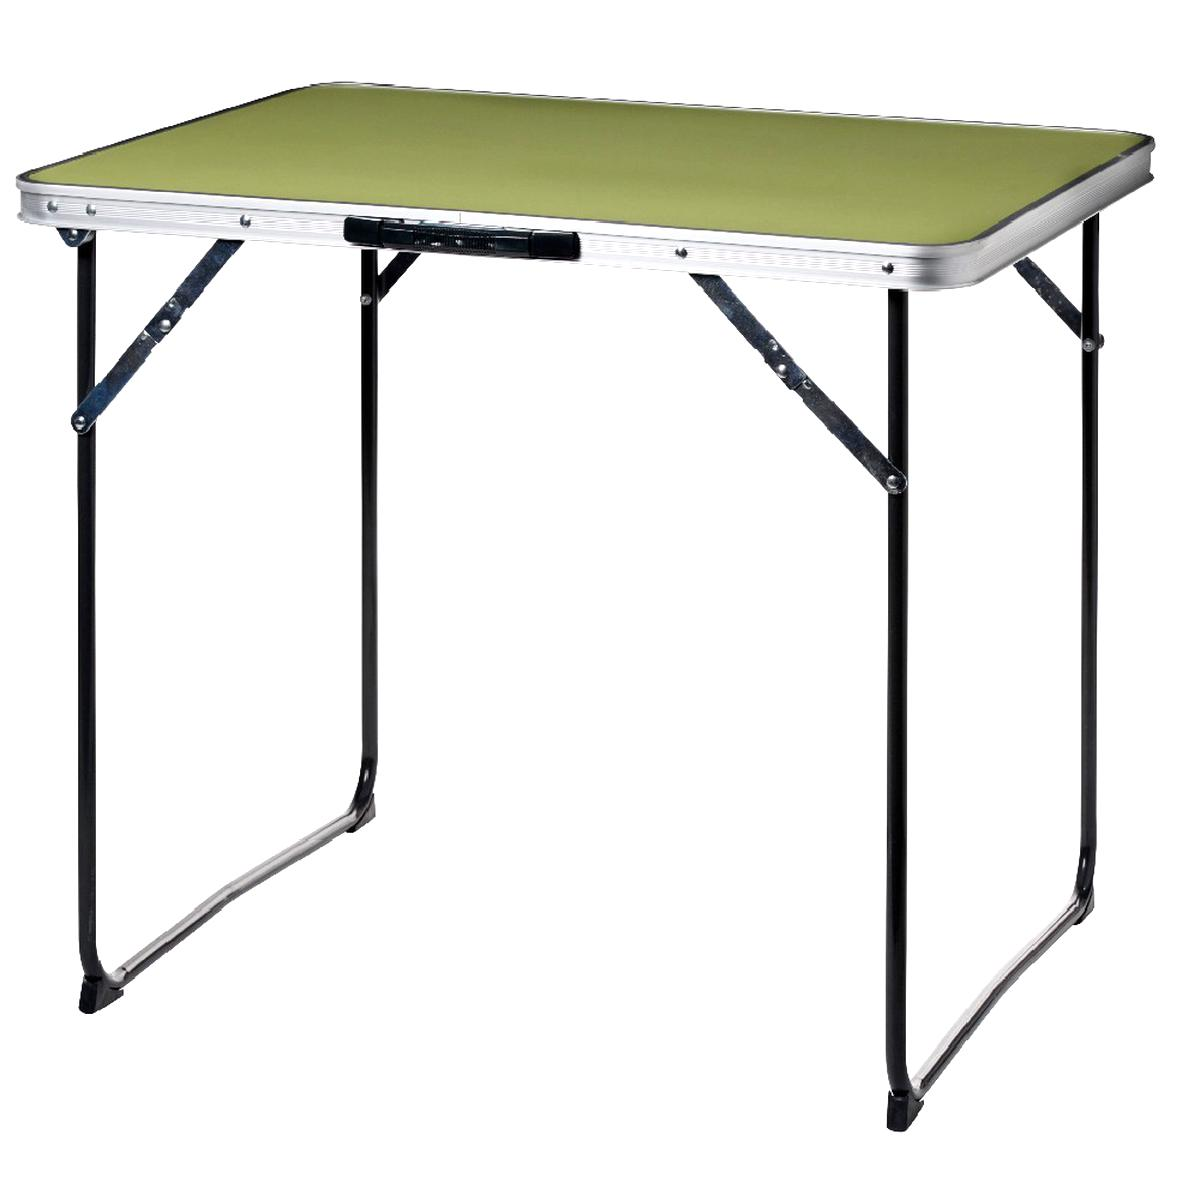 table camping pliante plastique d'occasion